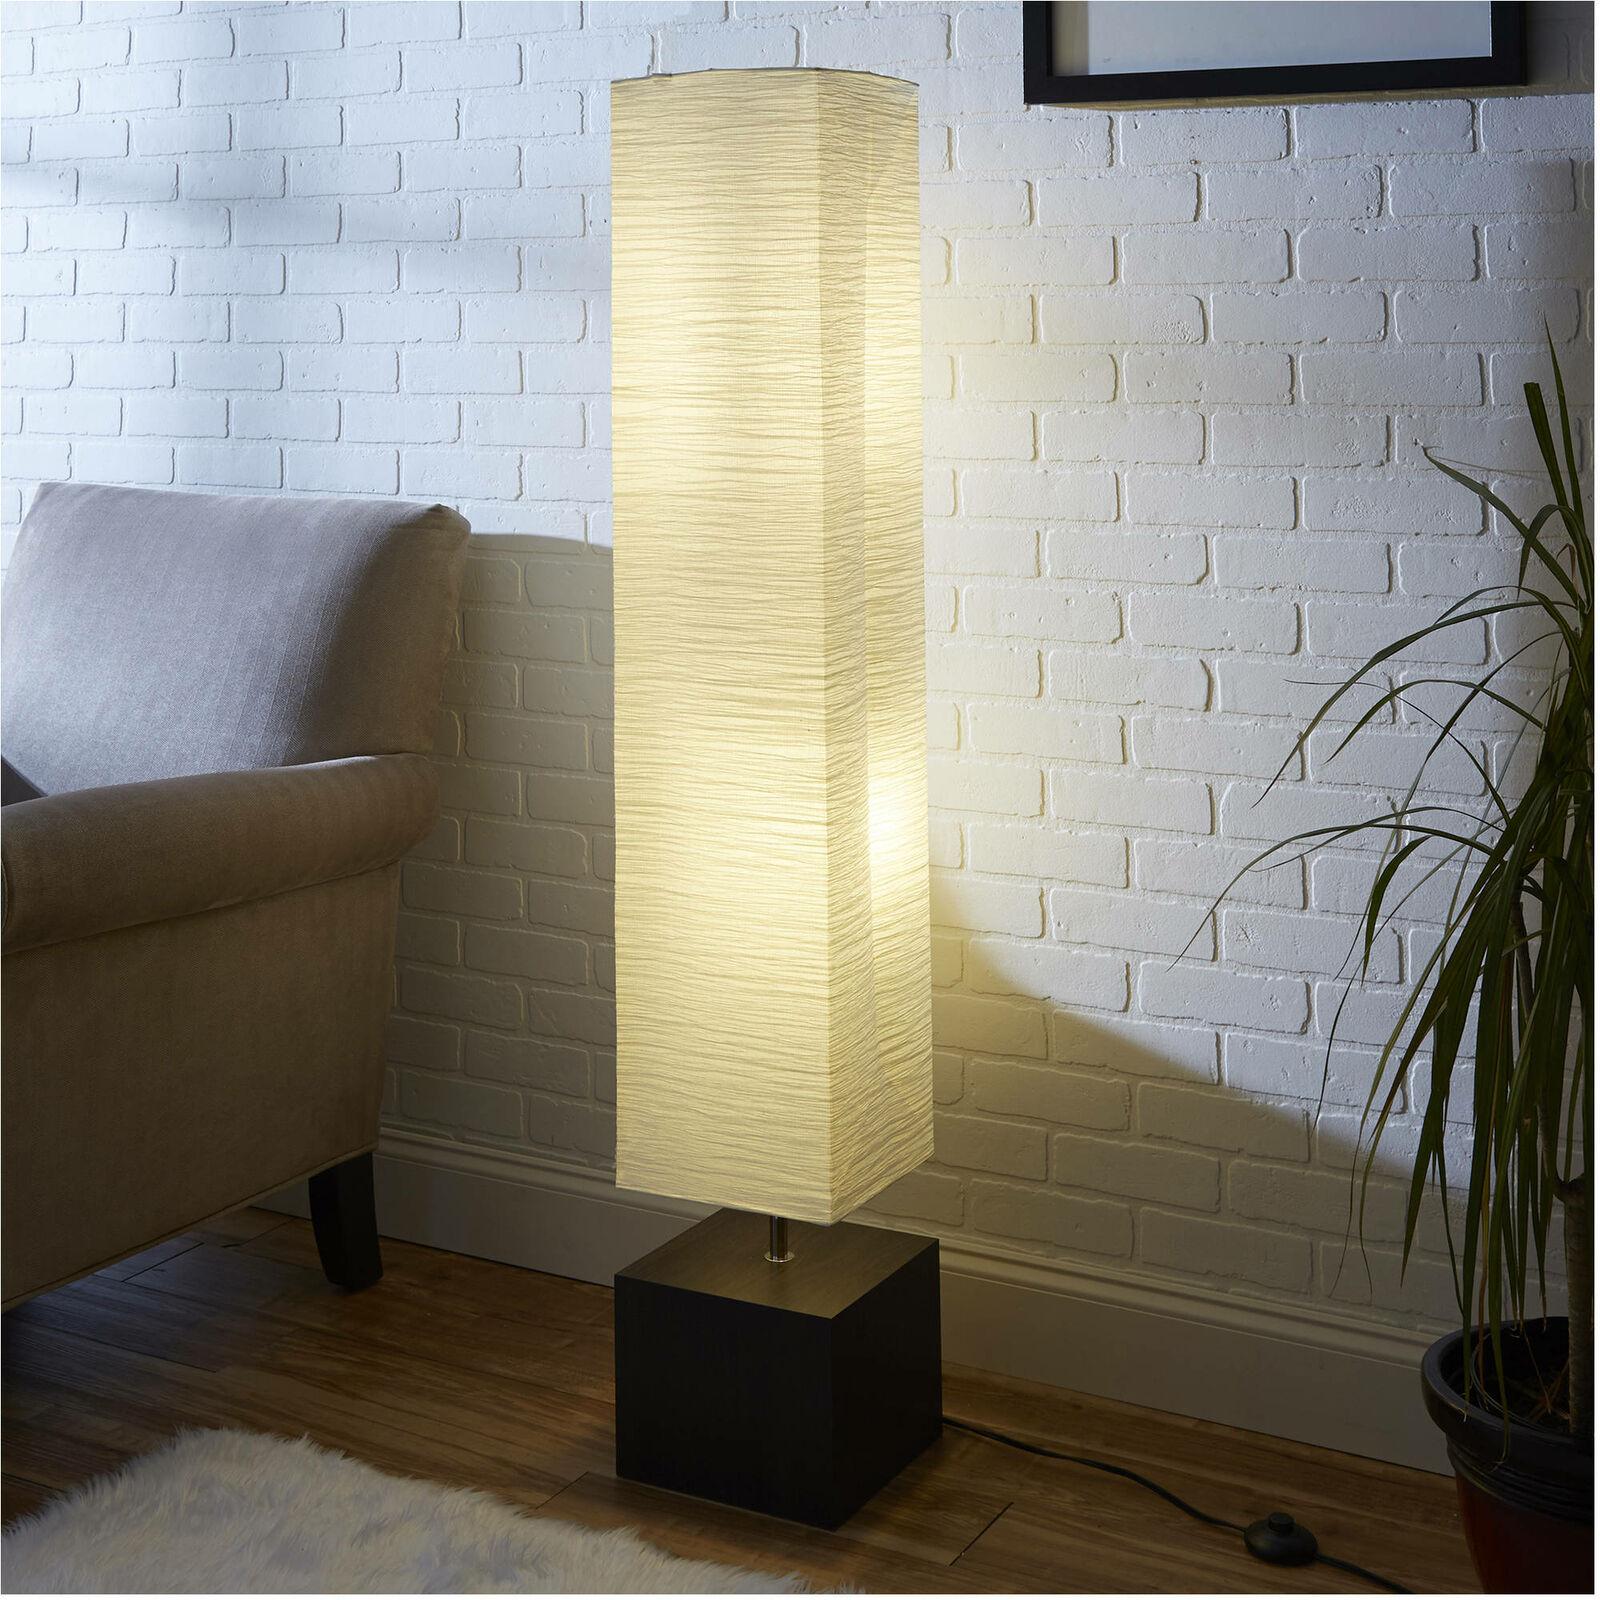 Ikea 301 841 73 Holmo Floor Lamp Light